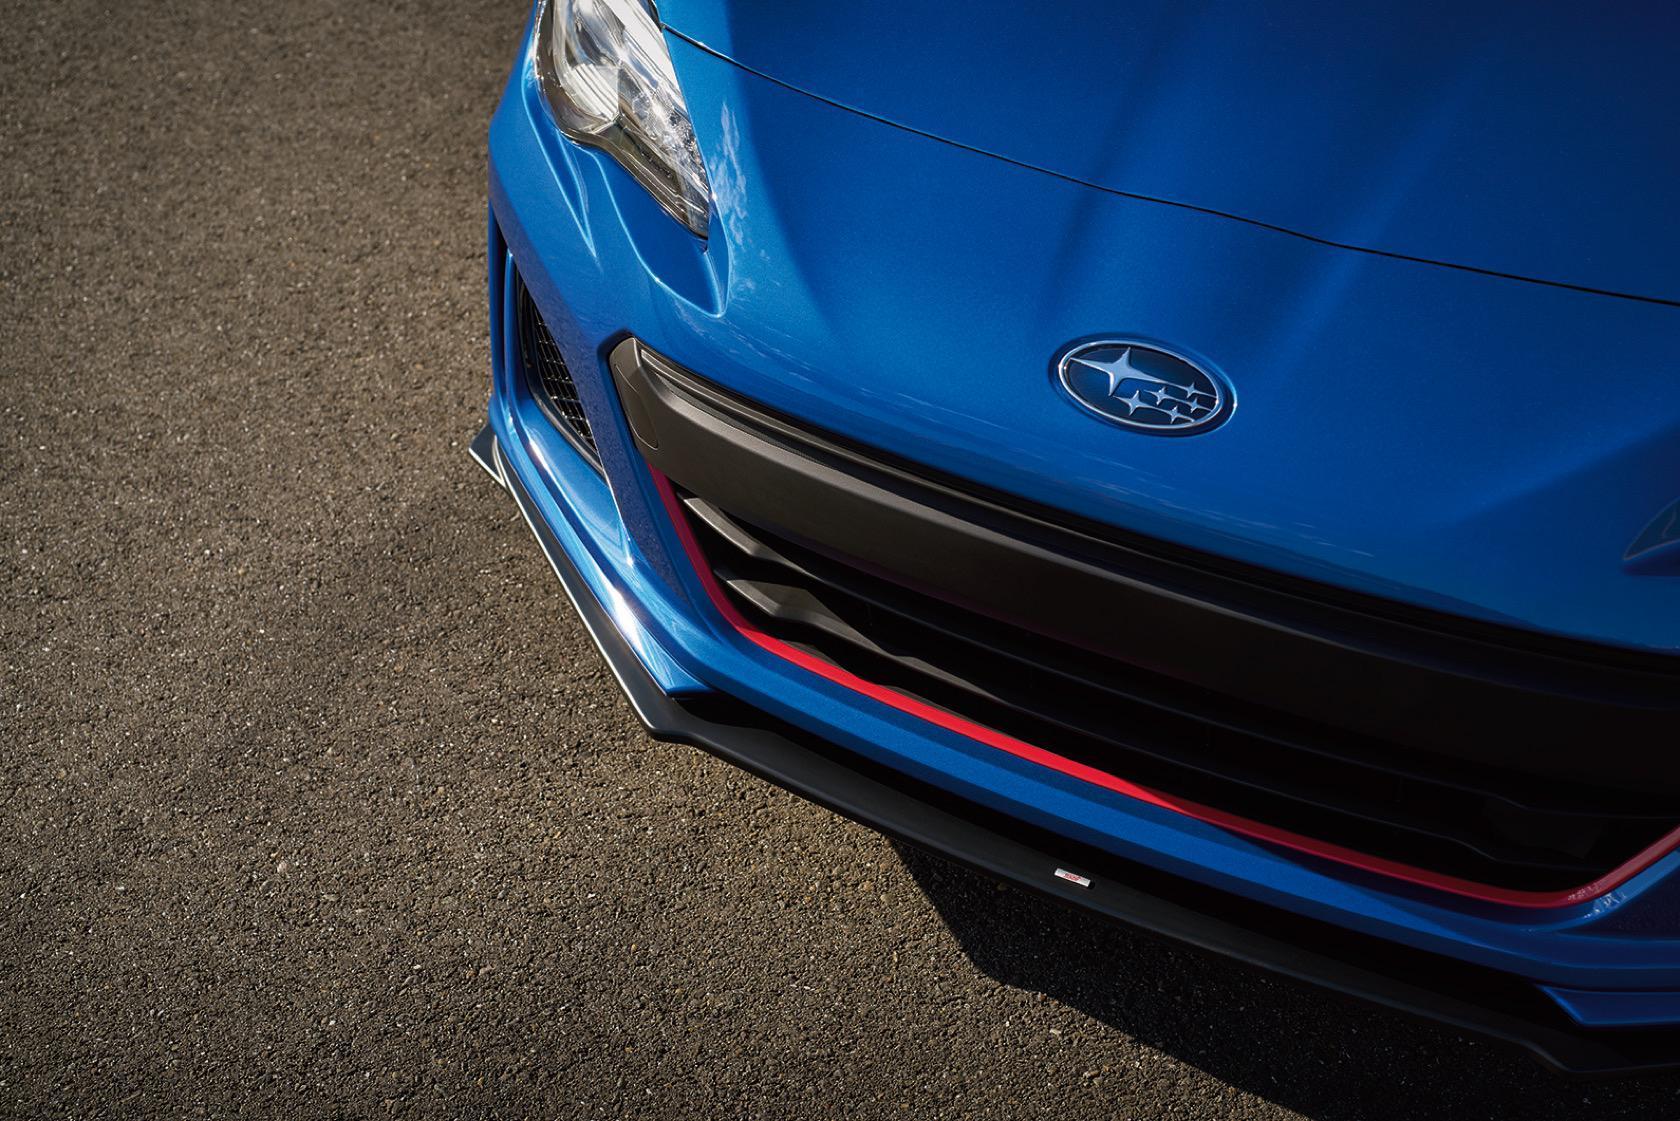 Subaru WRX STI Type RA and BRZ tS are 2018's hot blue